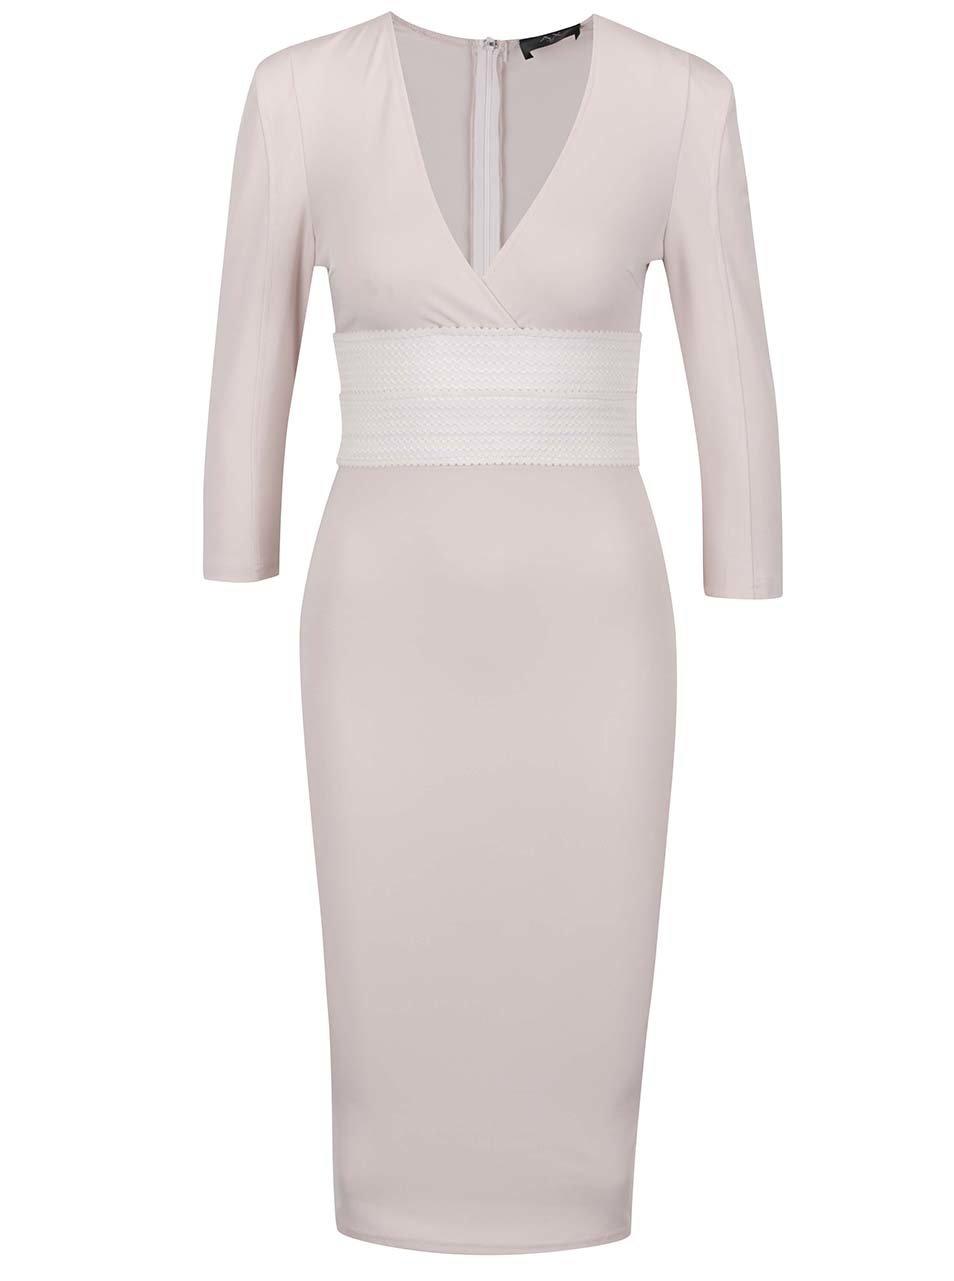 Béžové úzké šaty s véčkovým výstřihem AX Paris